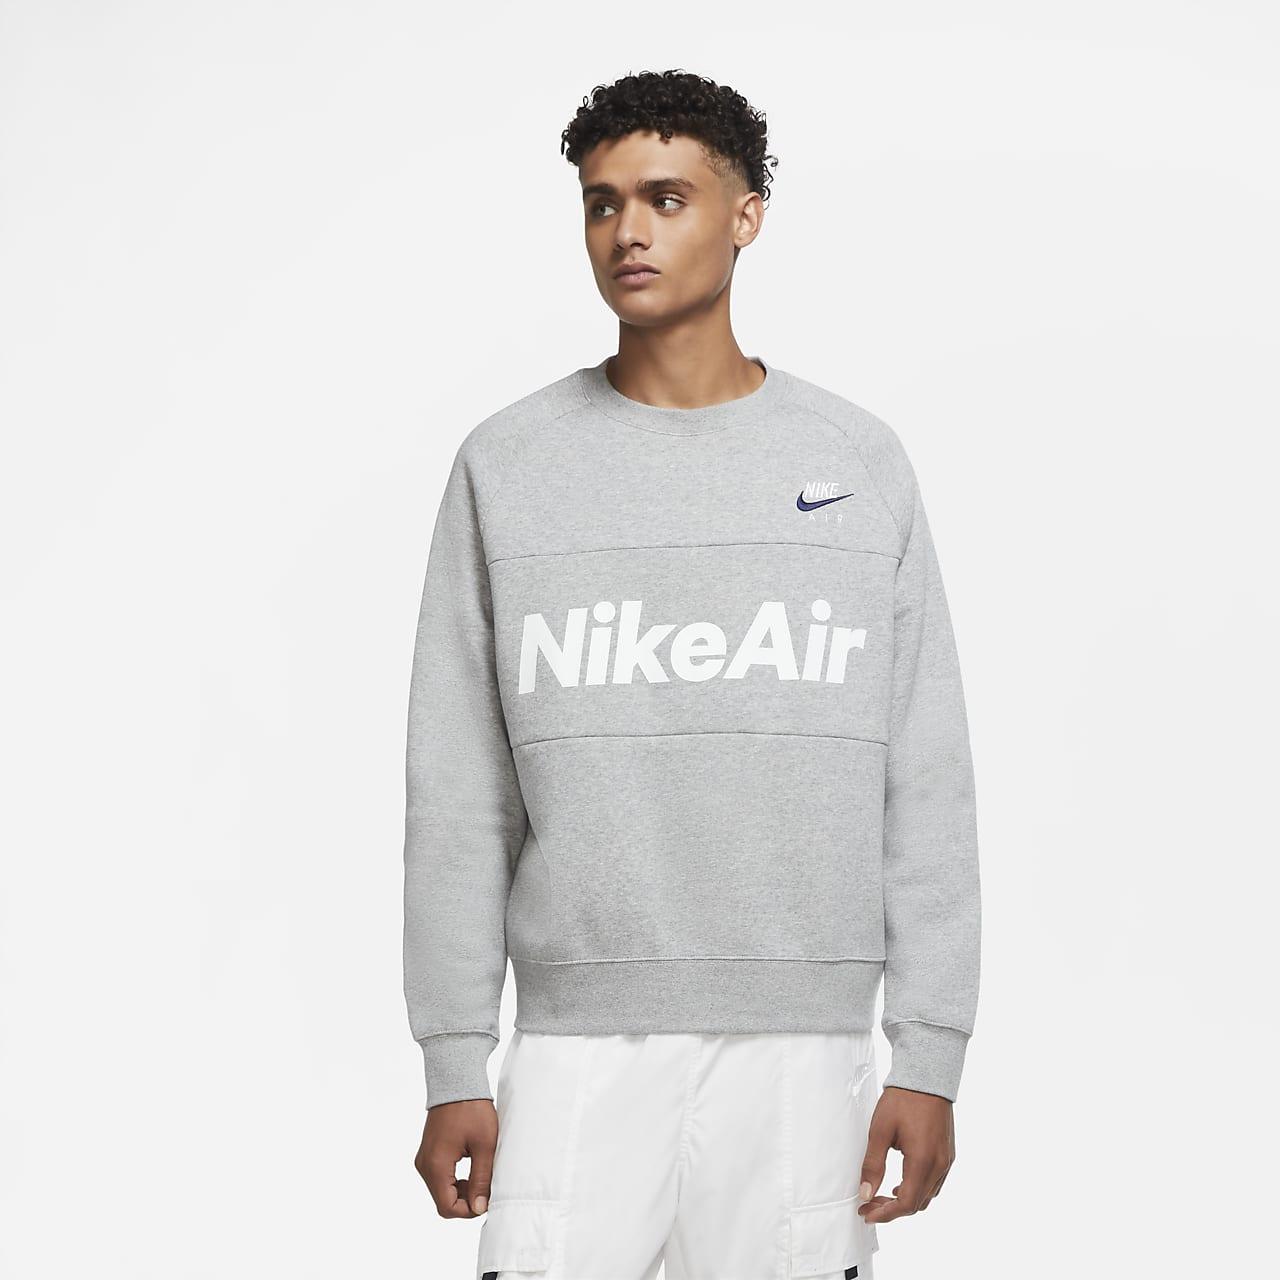 Nike Air Men's Fleece Crew